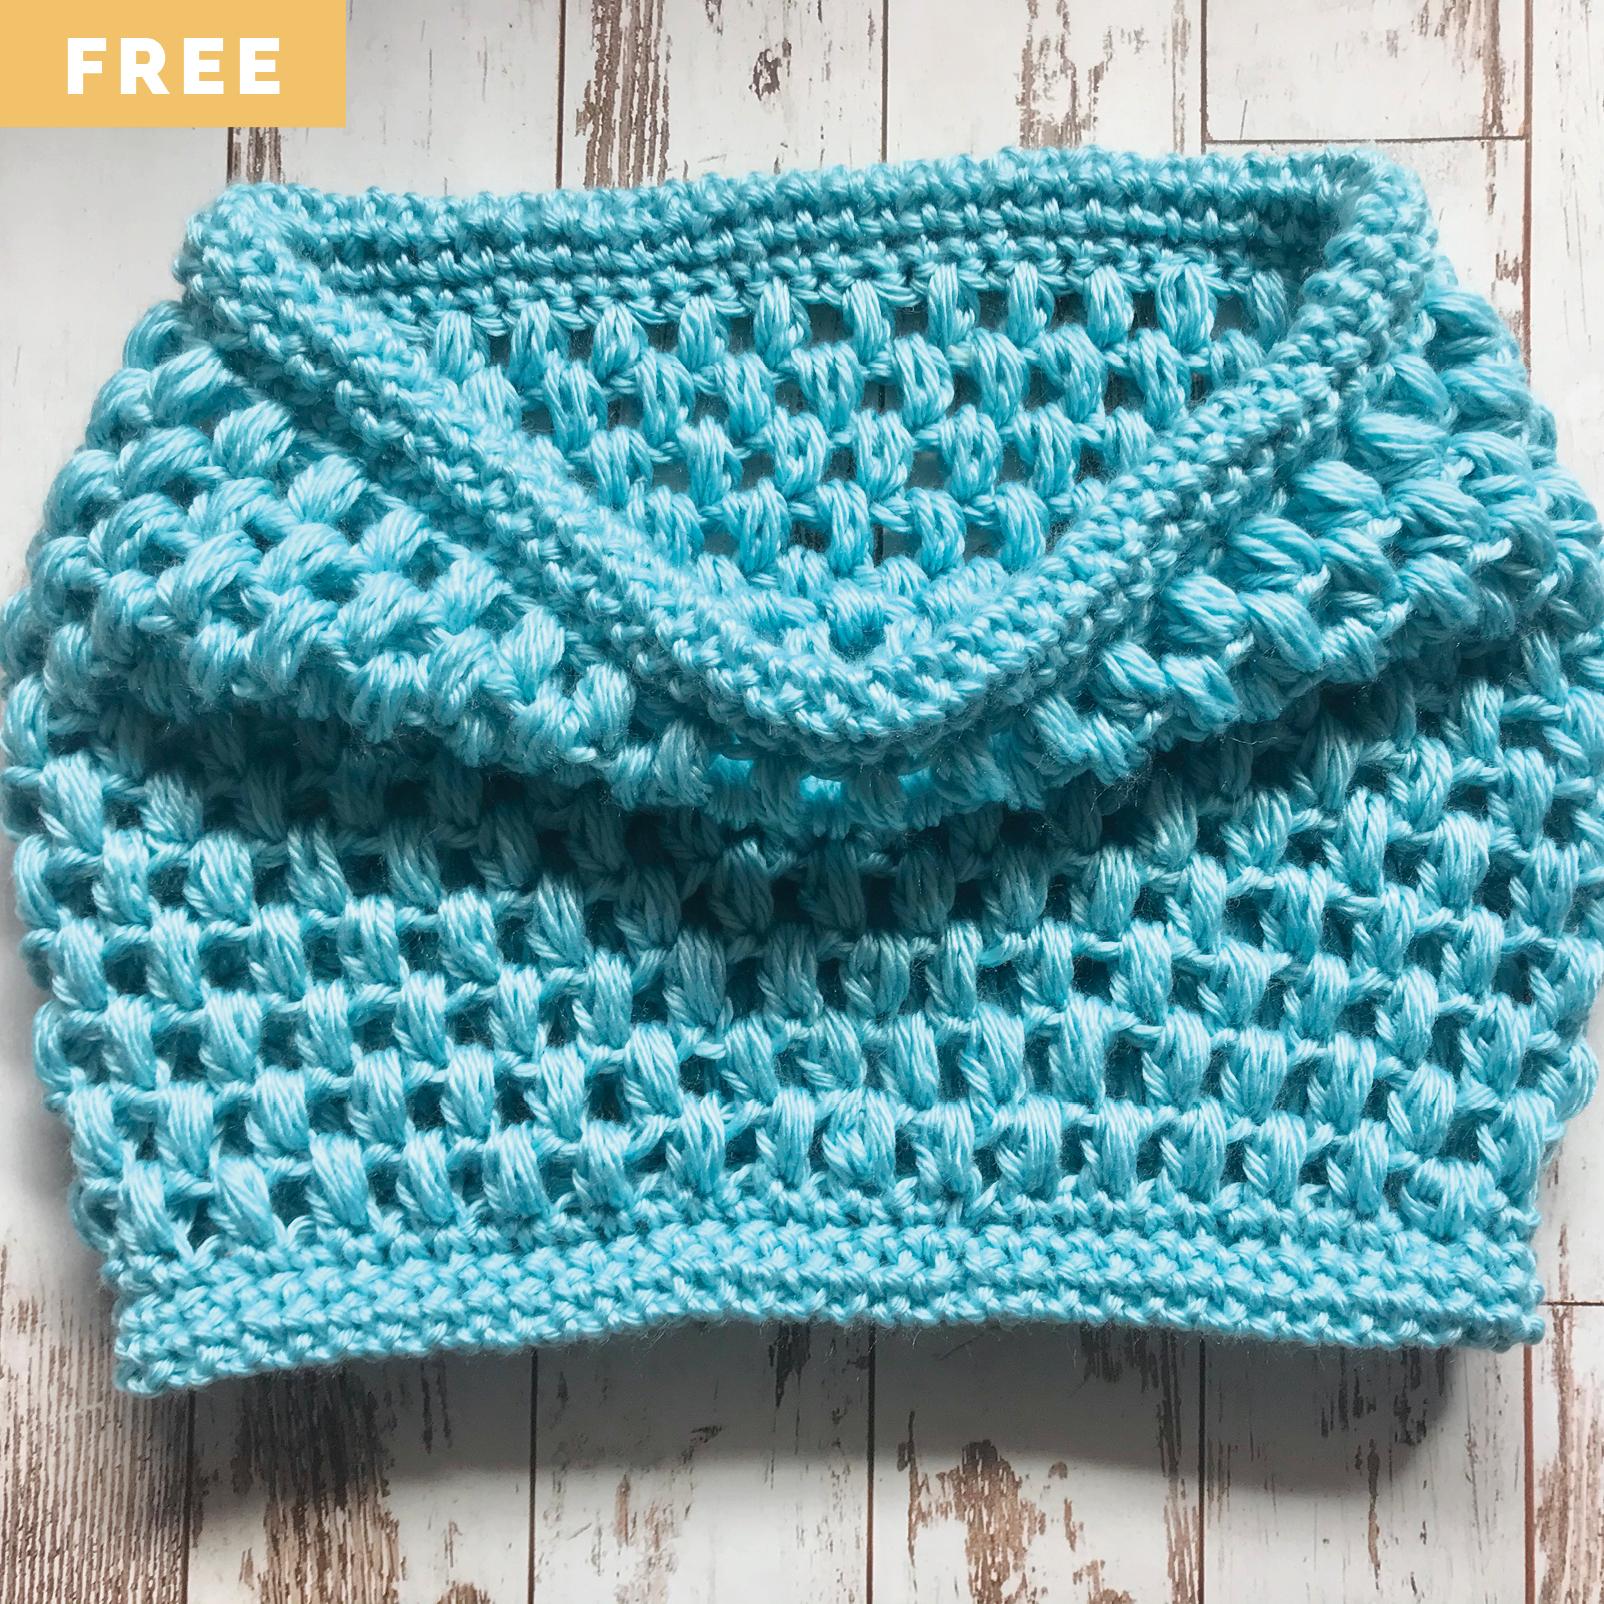 Free Crochet Pattern - Puff Love Cowl